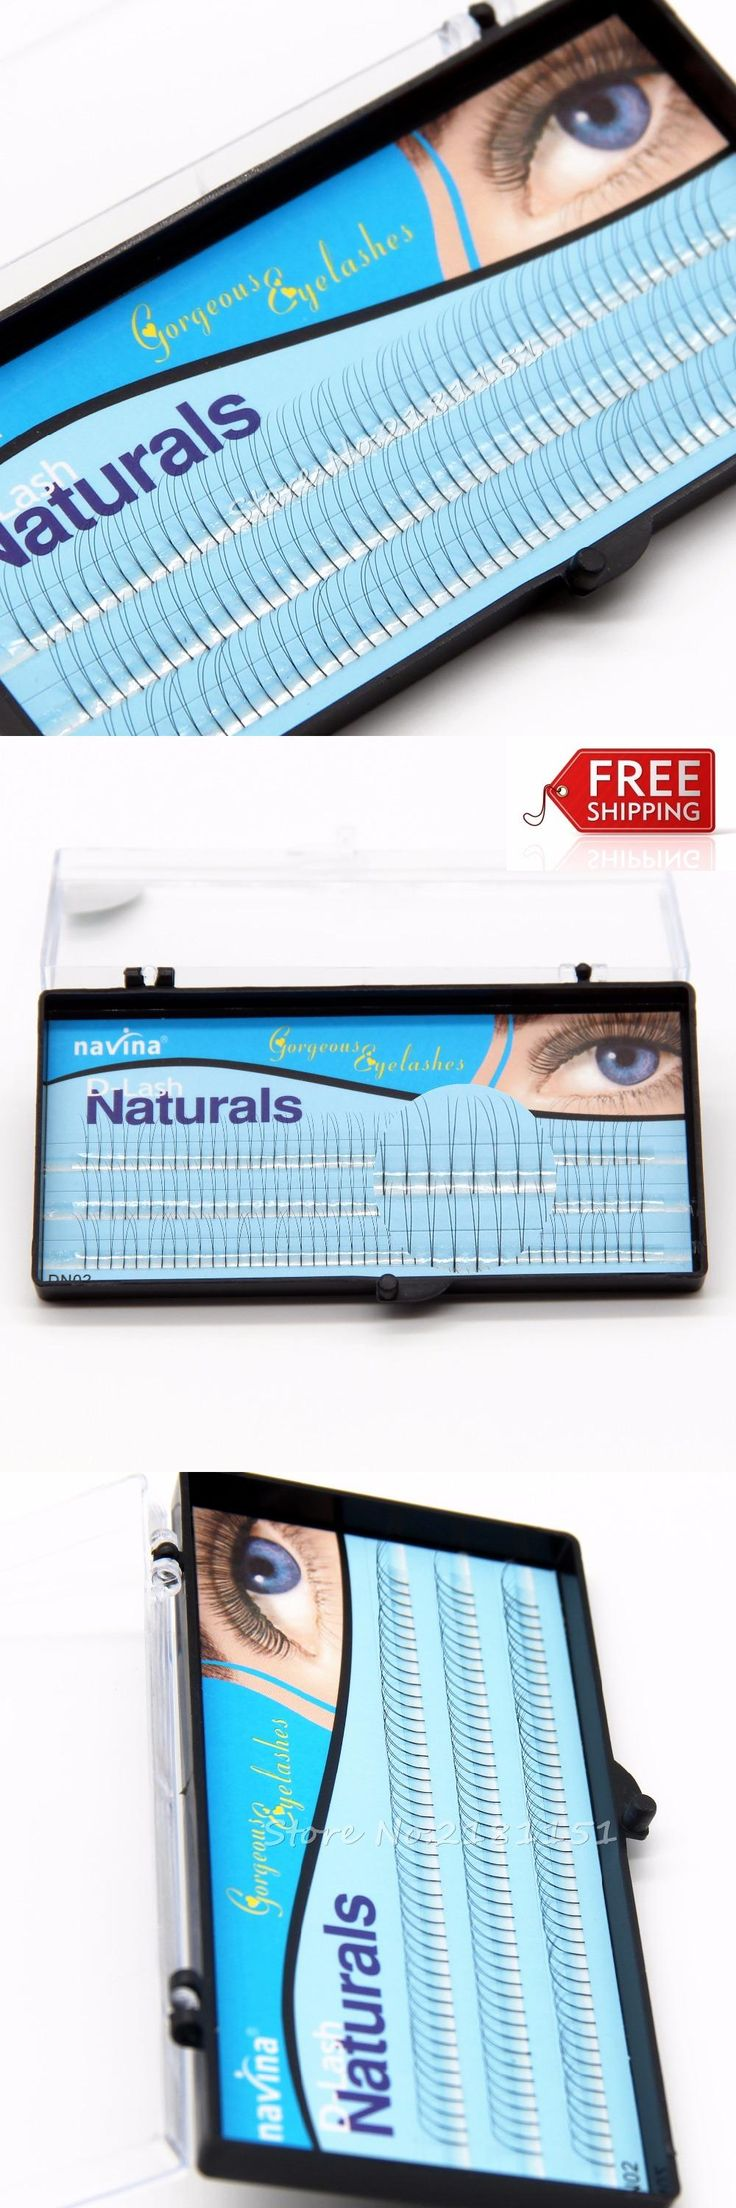 [Visit to Buy] NAVINA 2 Flairs V Type Black Cluster Eyelashes 0.1mm C curl 8/10/12mm Nature Soft False Eyelash Extension Lashes Makeup tool #Advertisement